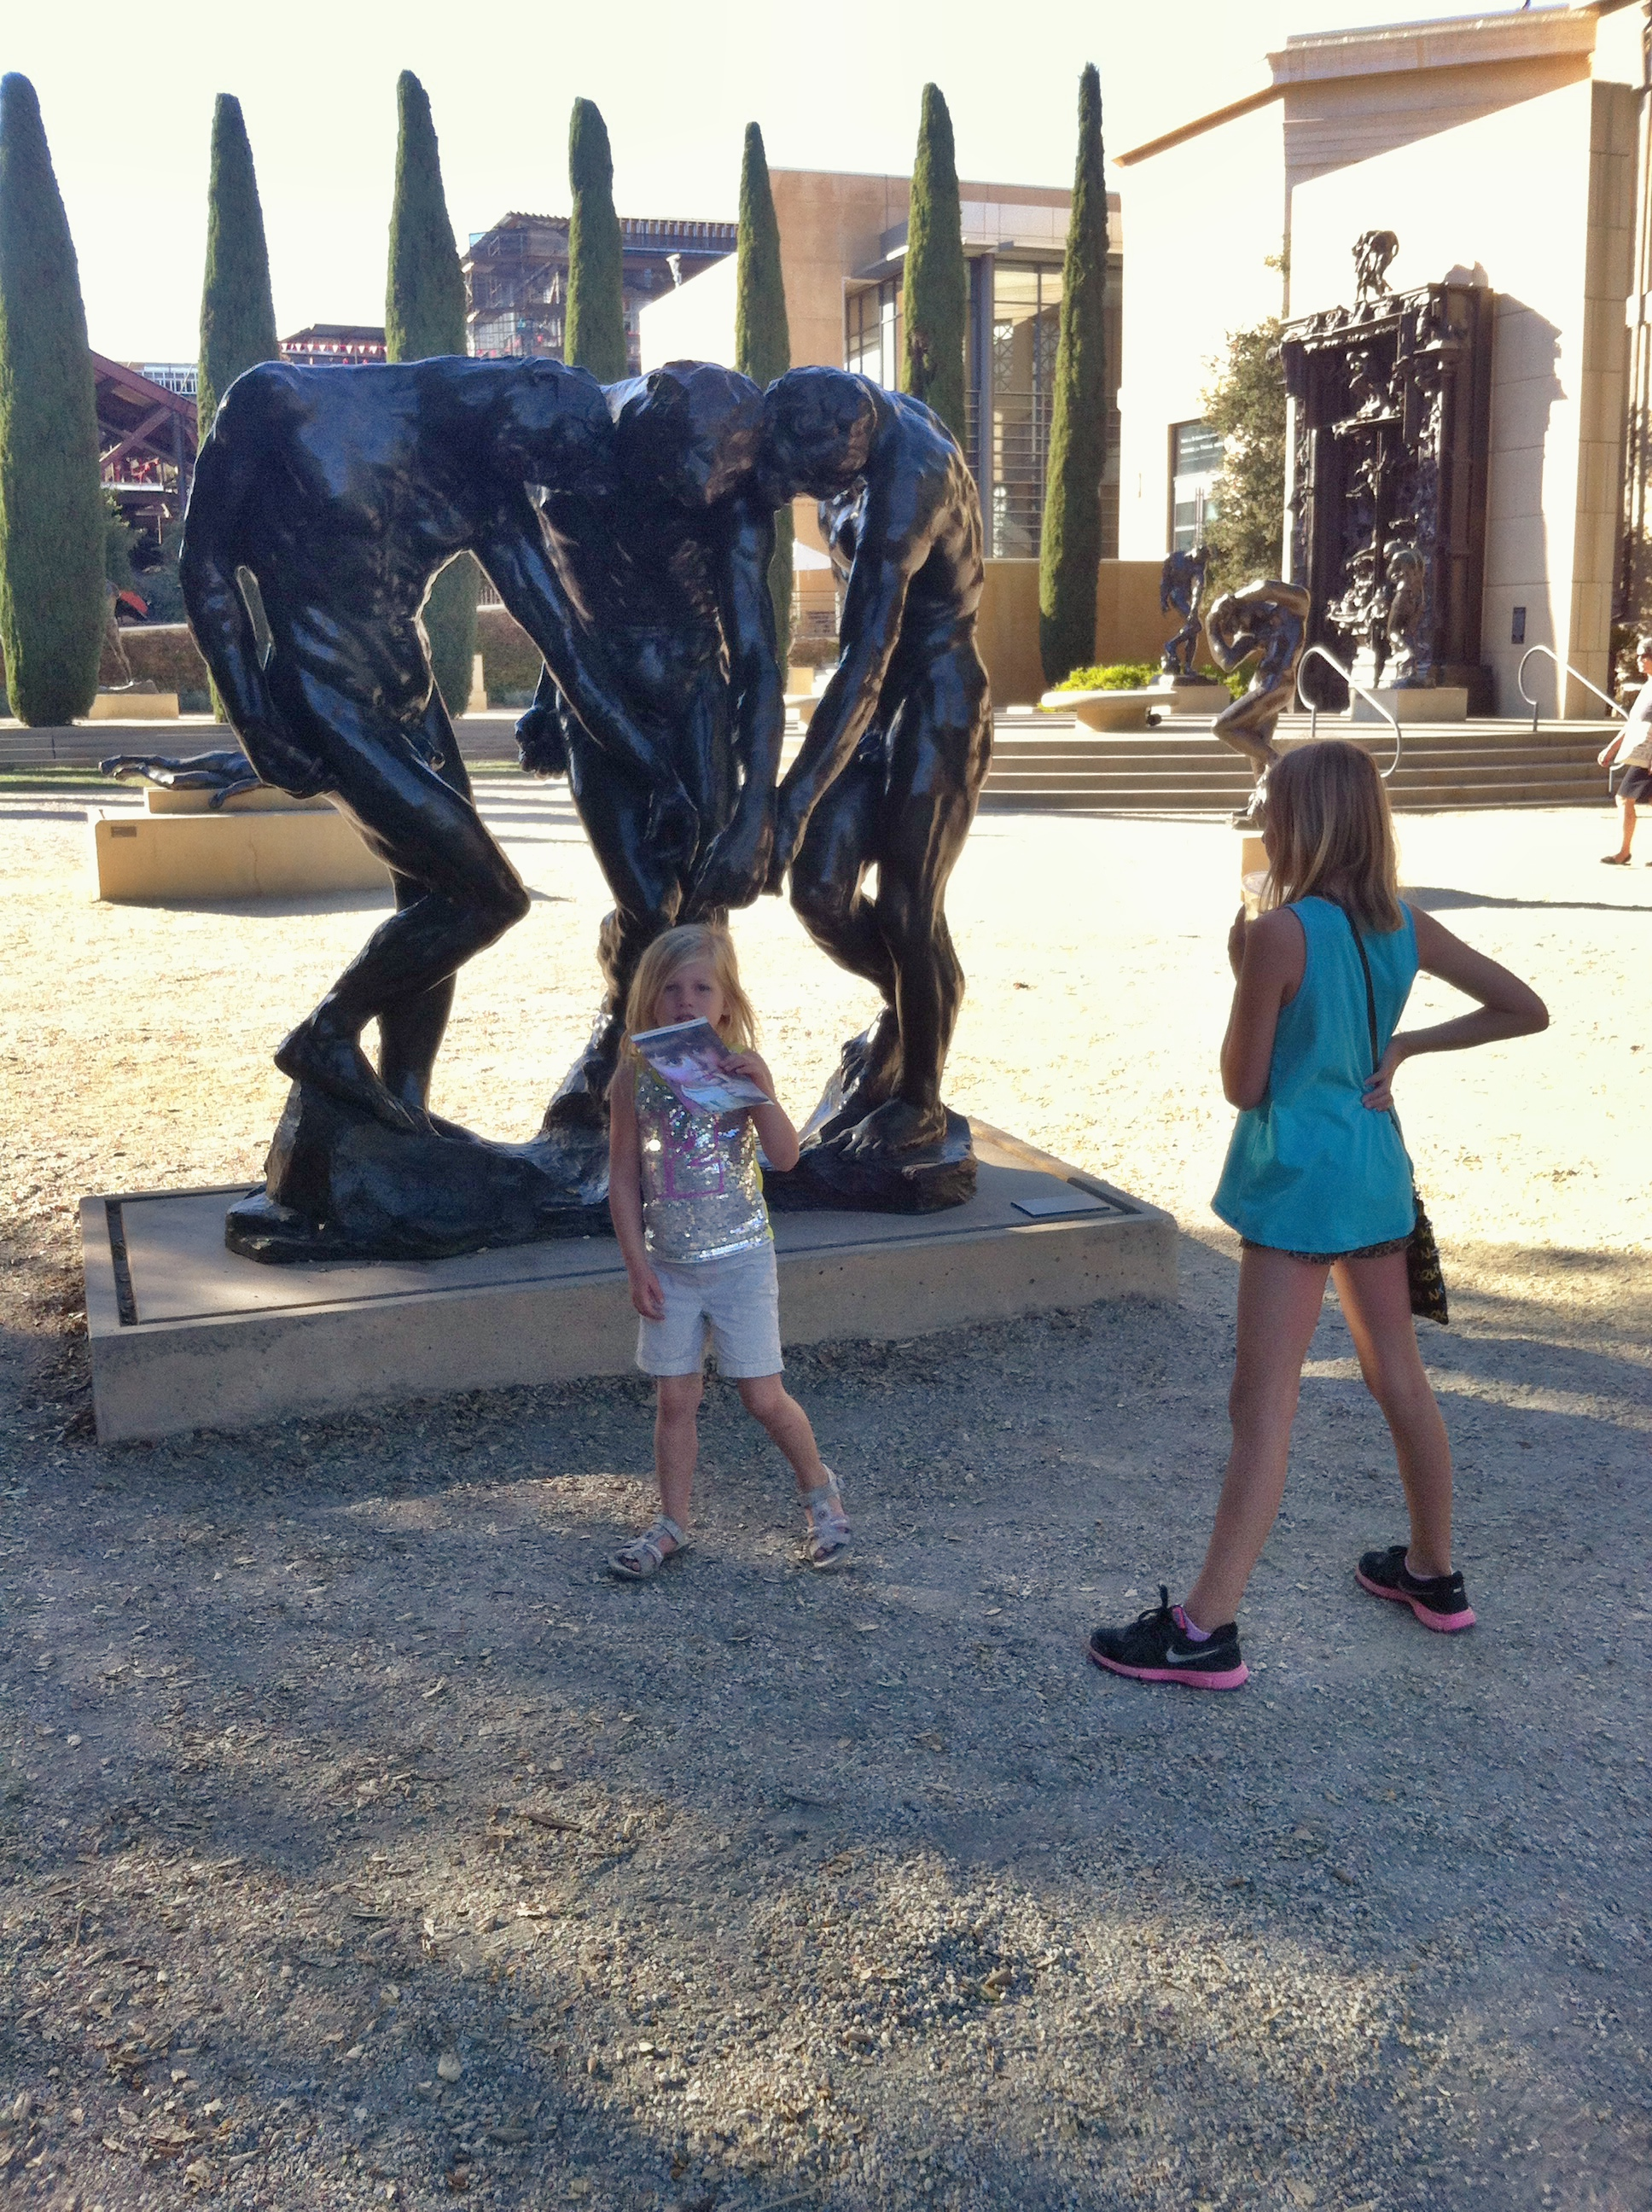 Wandering around the statues